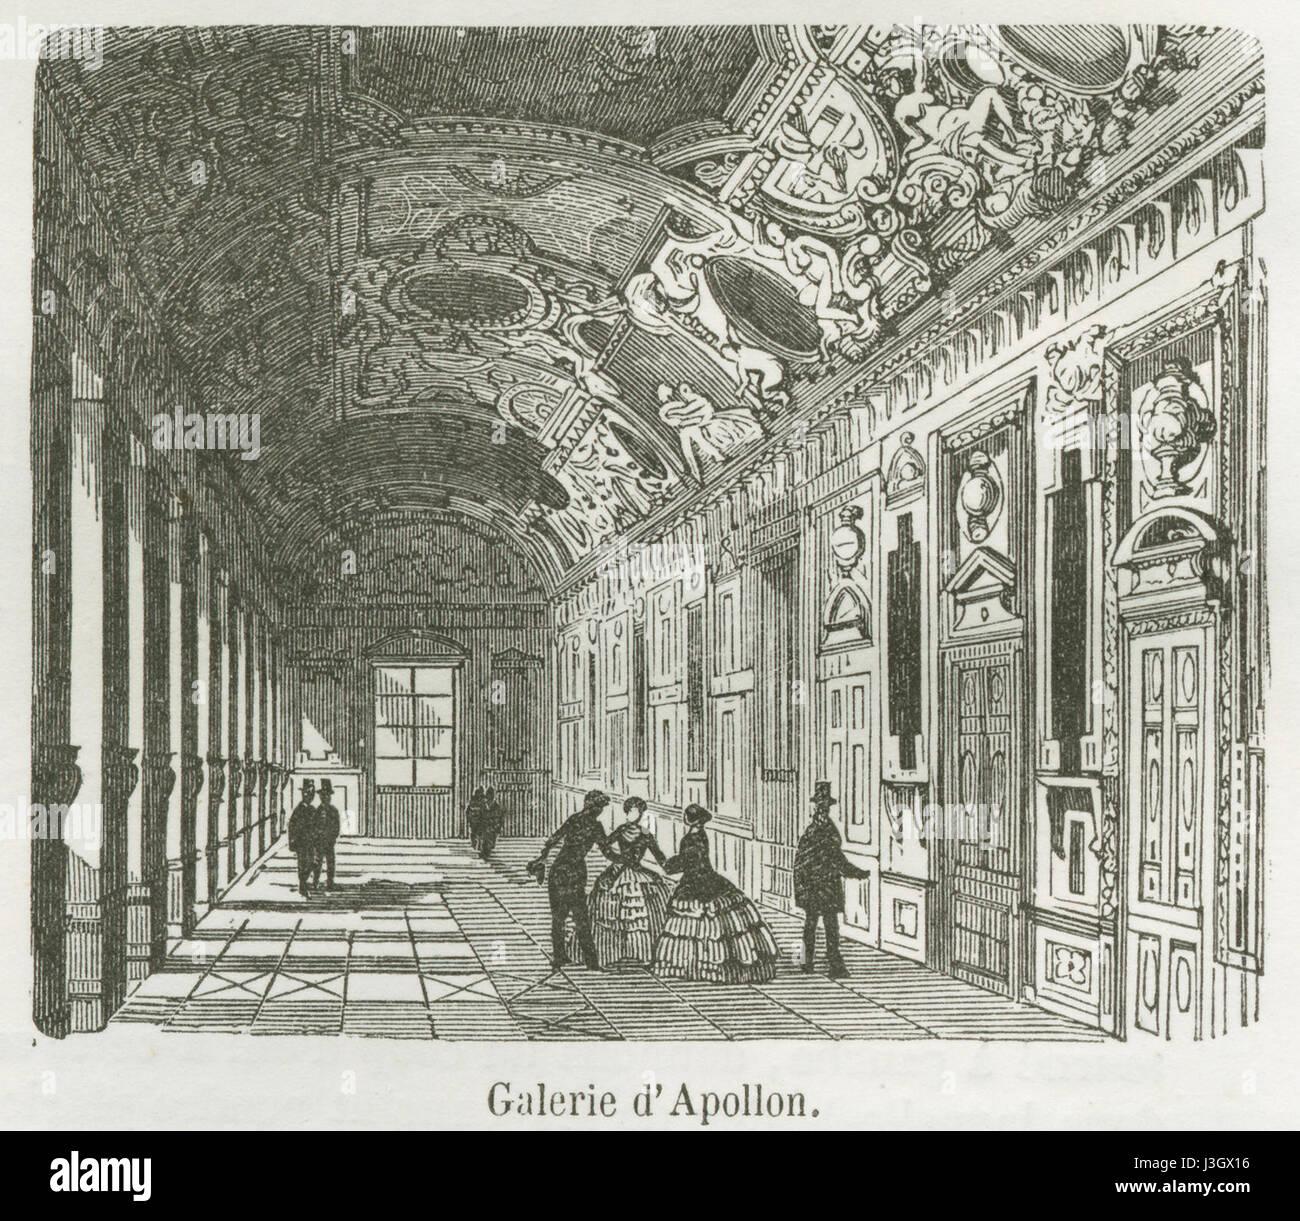 Galerie d'Apollon, 1855 - Stock Image